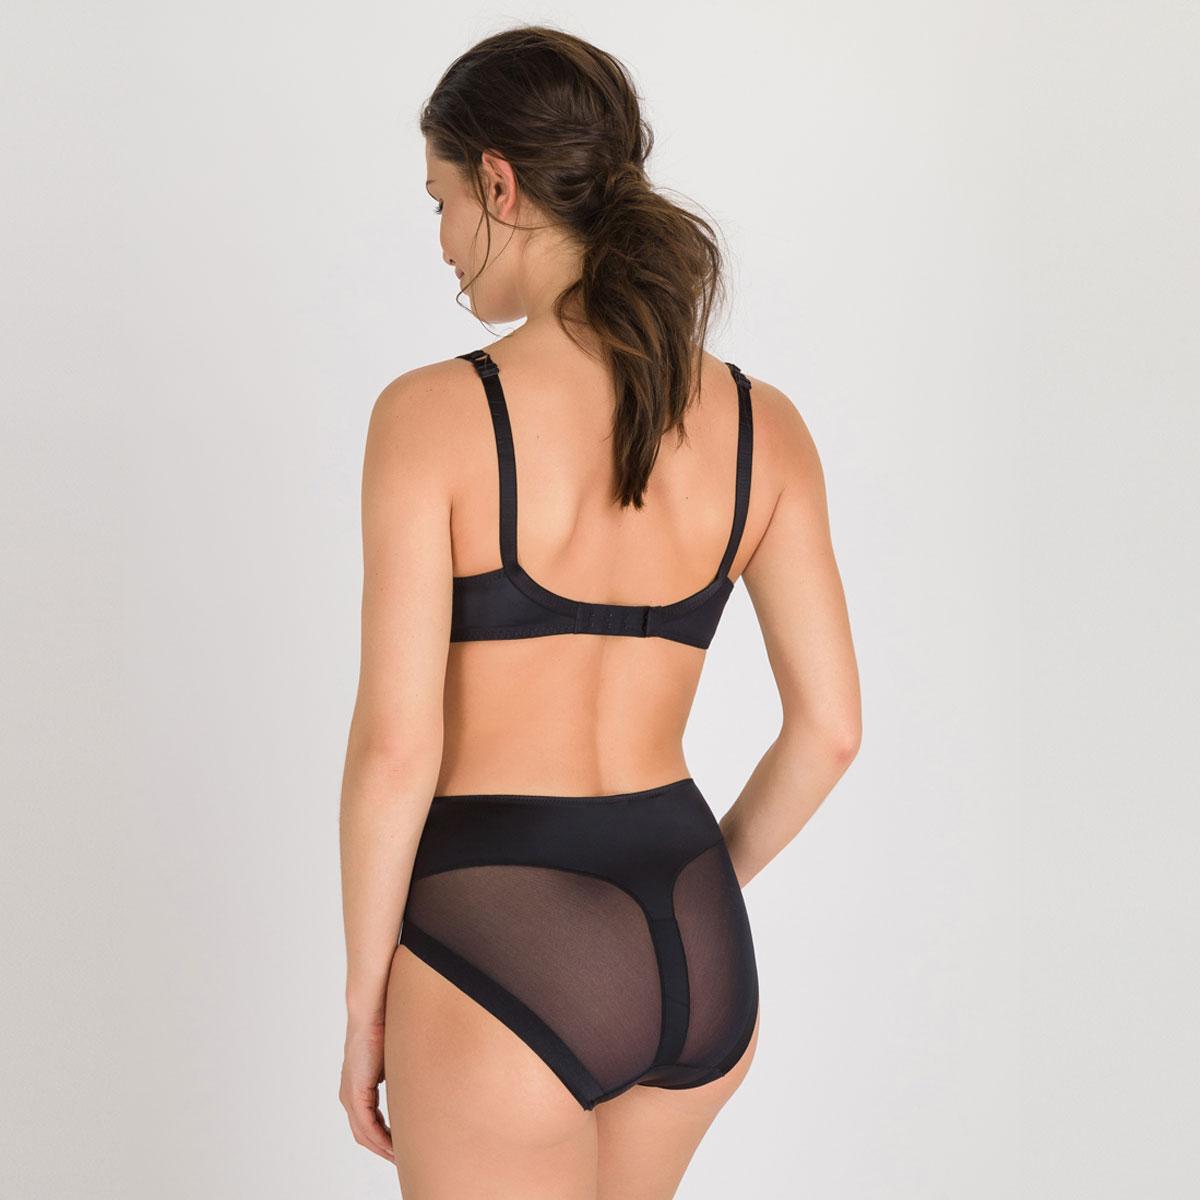 Culotte Maxi invisible noire - Perfect Silhouette-PLAYTEX